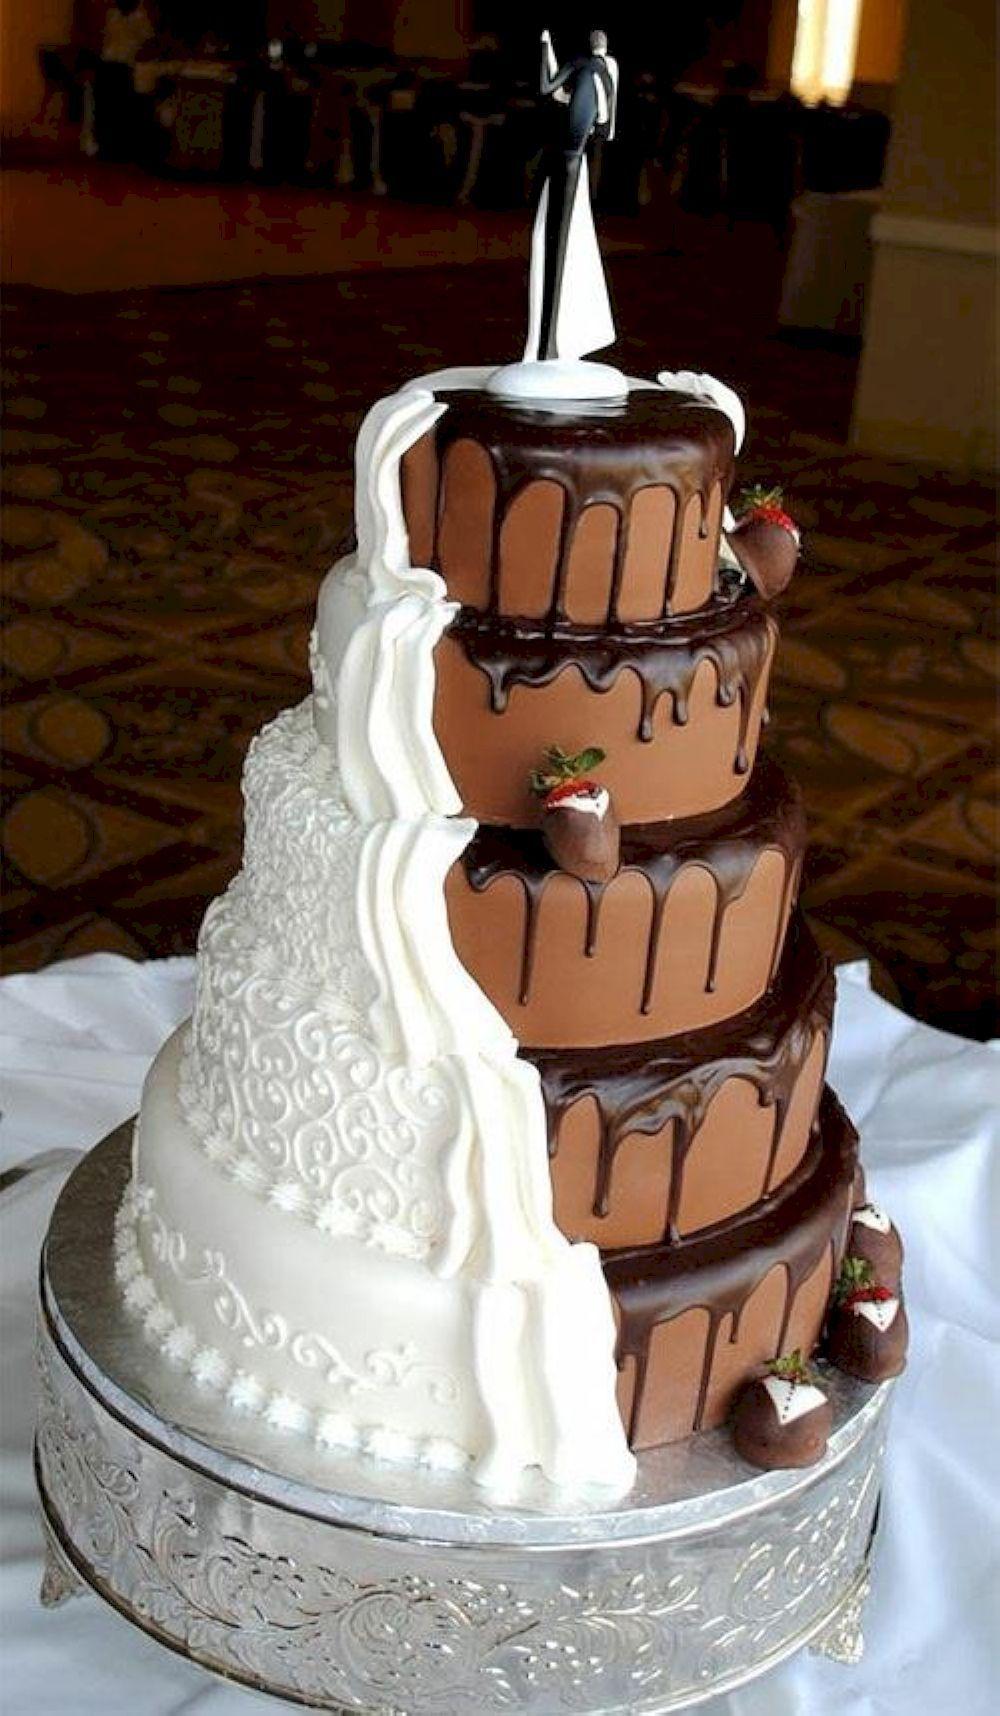 2017 05 vintage wedding cakes dallas - 200 Fantastic Wedding Cake Ideas For Your Wedding